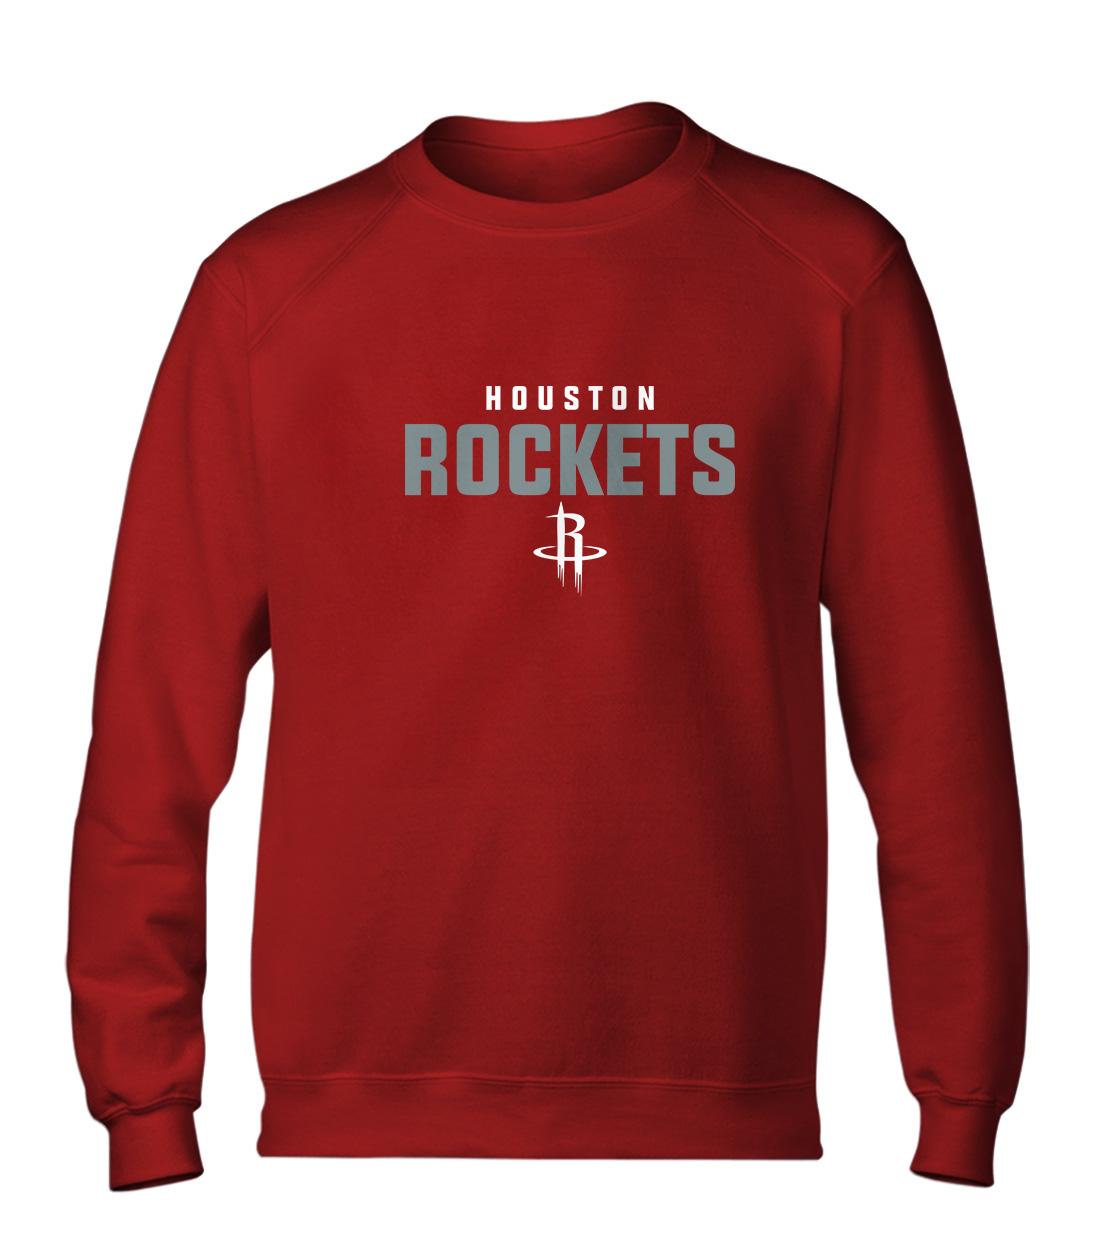 Houston Rockets Basic (BSC-RED-NP-108-NBA-HOU-ROCKETS.FLAT)